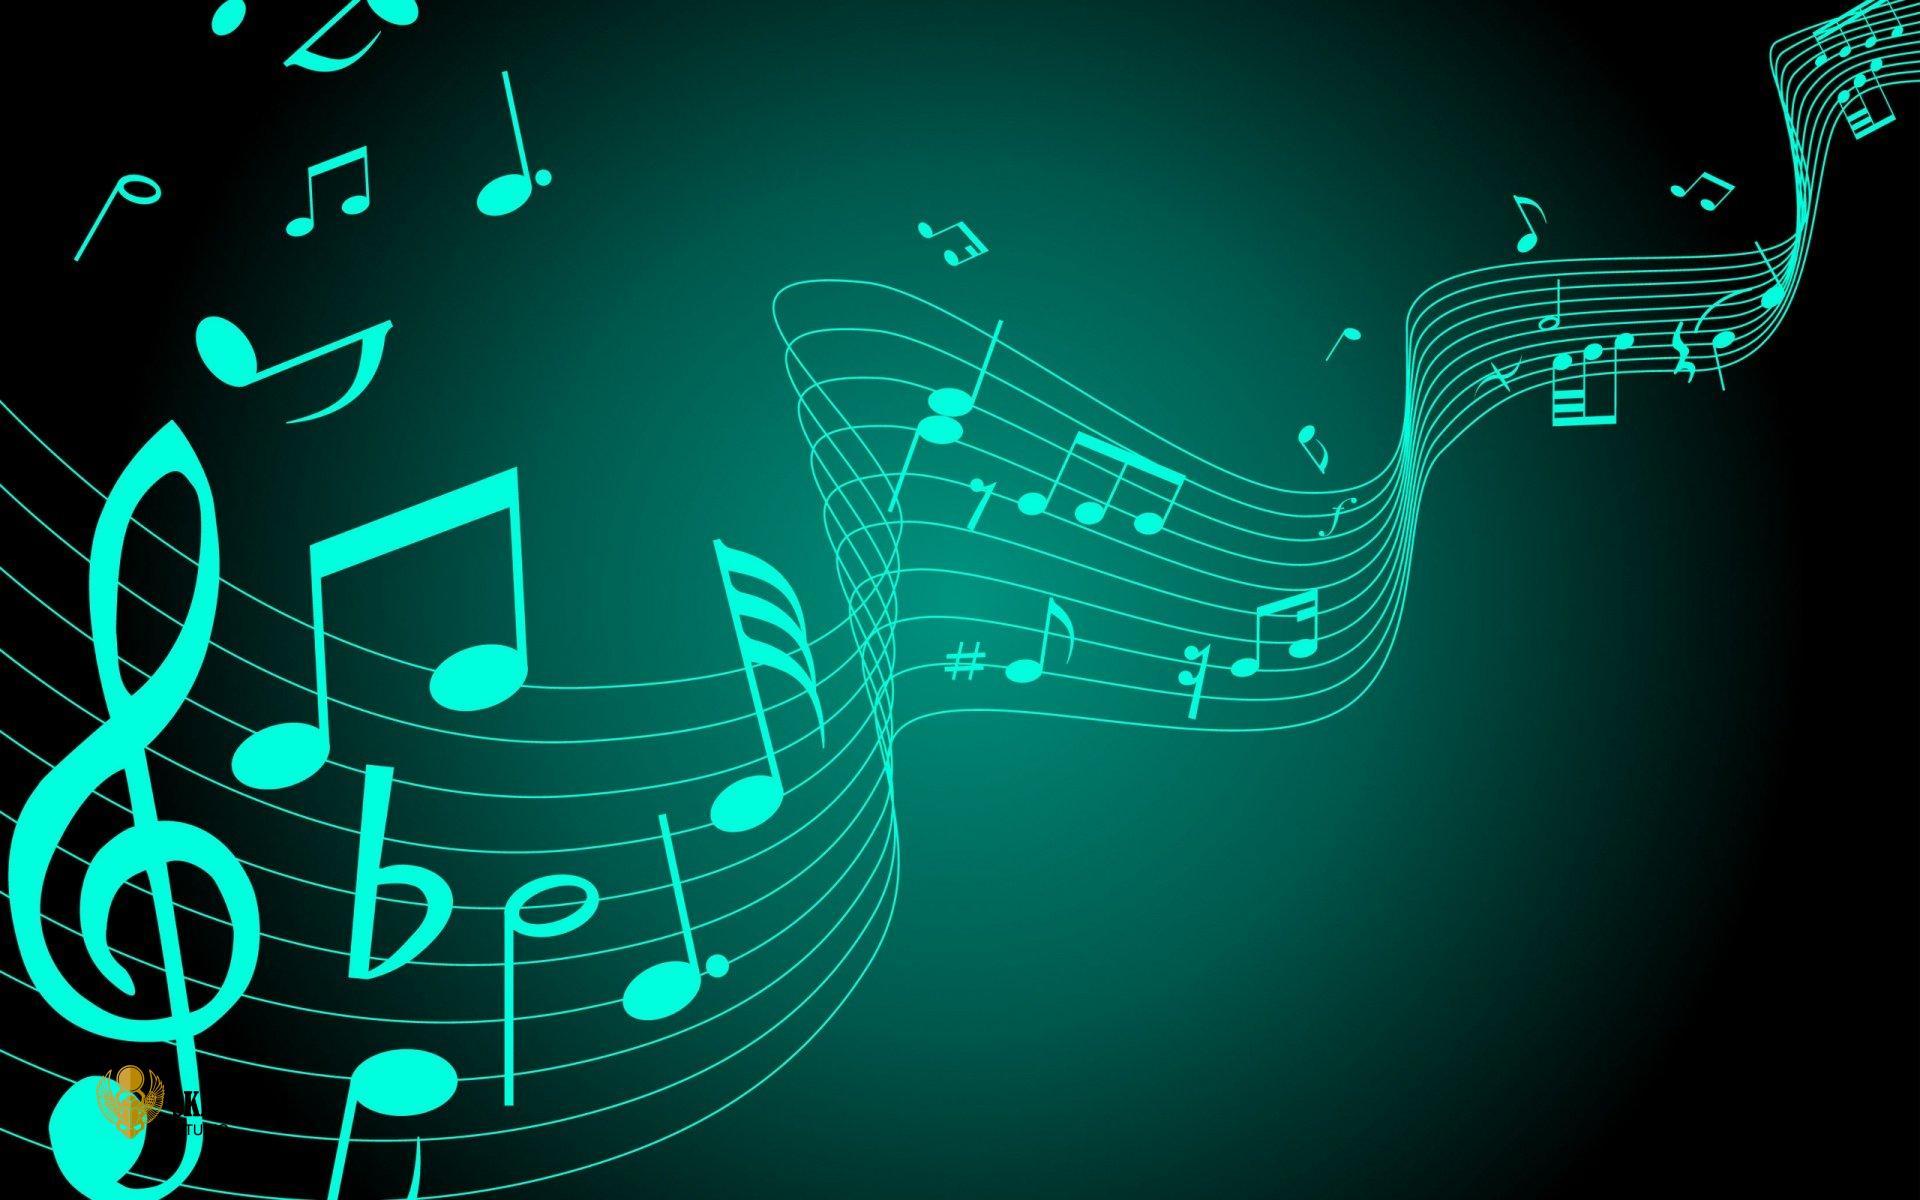 music-wallpapers-desktop-On-wallpaper-hd